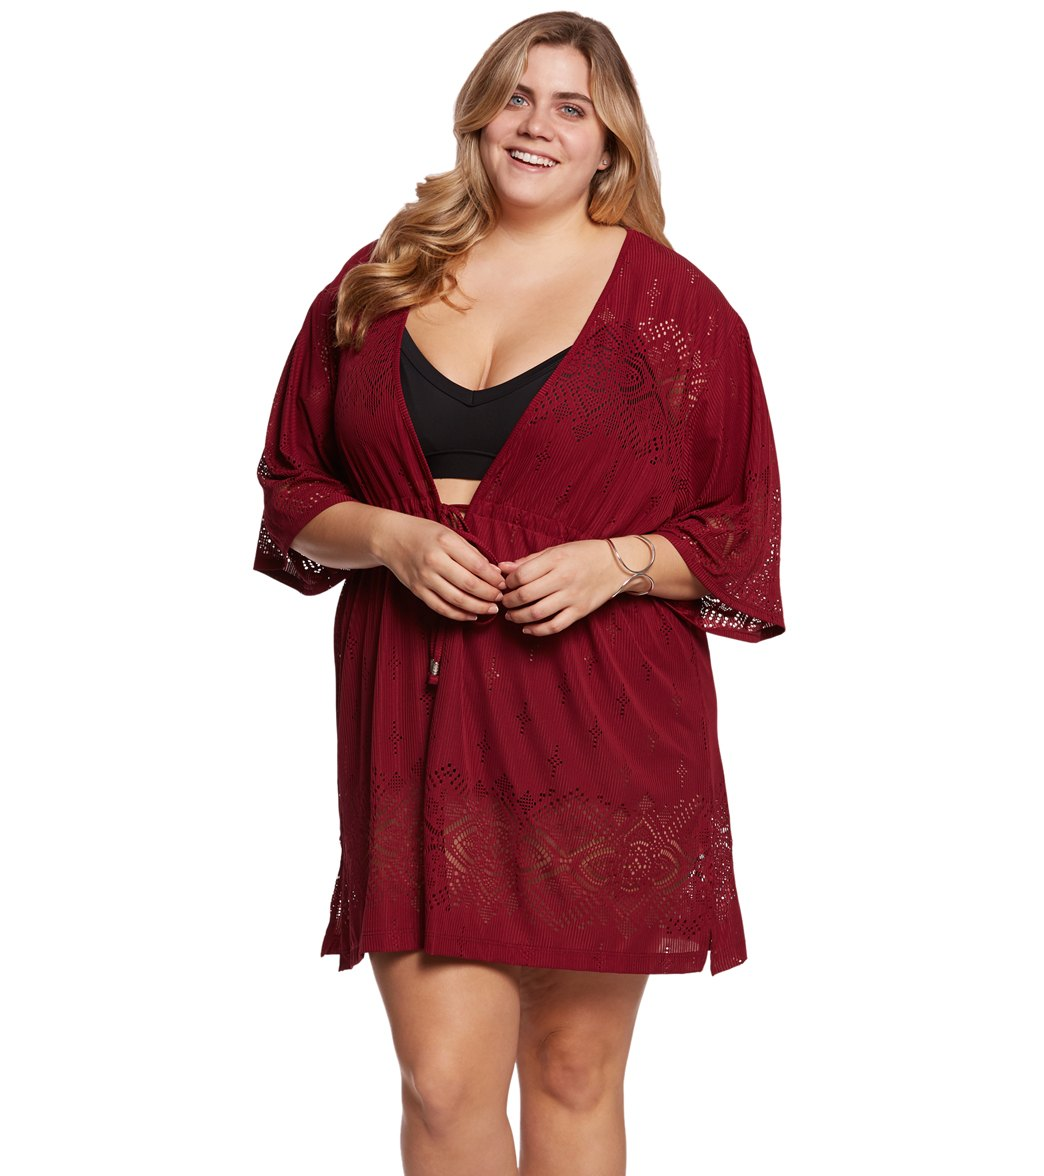 626353c080 Dotti Plus Size Gypsy Dance Kimono Tunic at SwimOutlet.com - Free Shipping